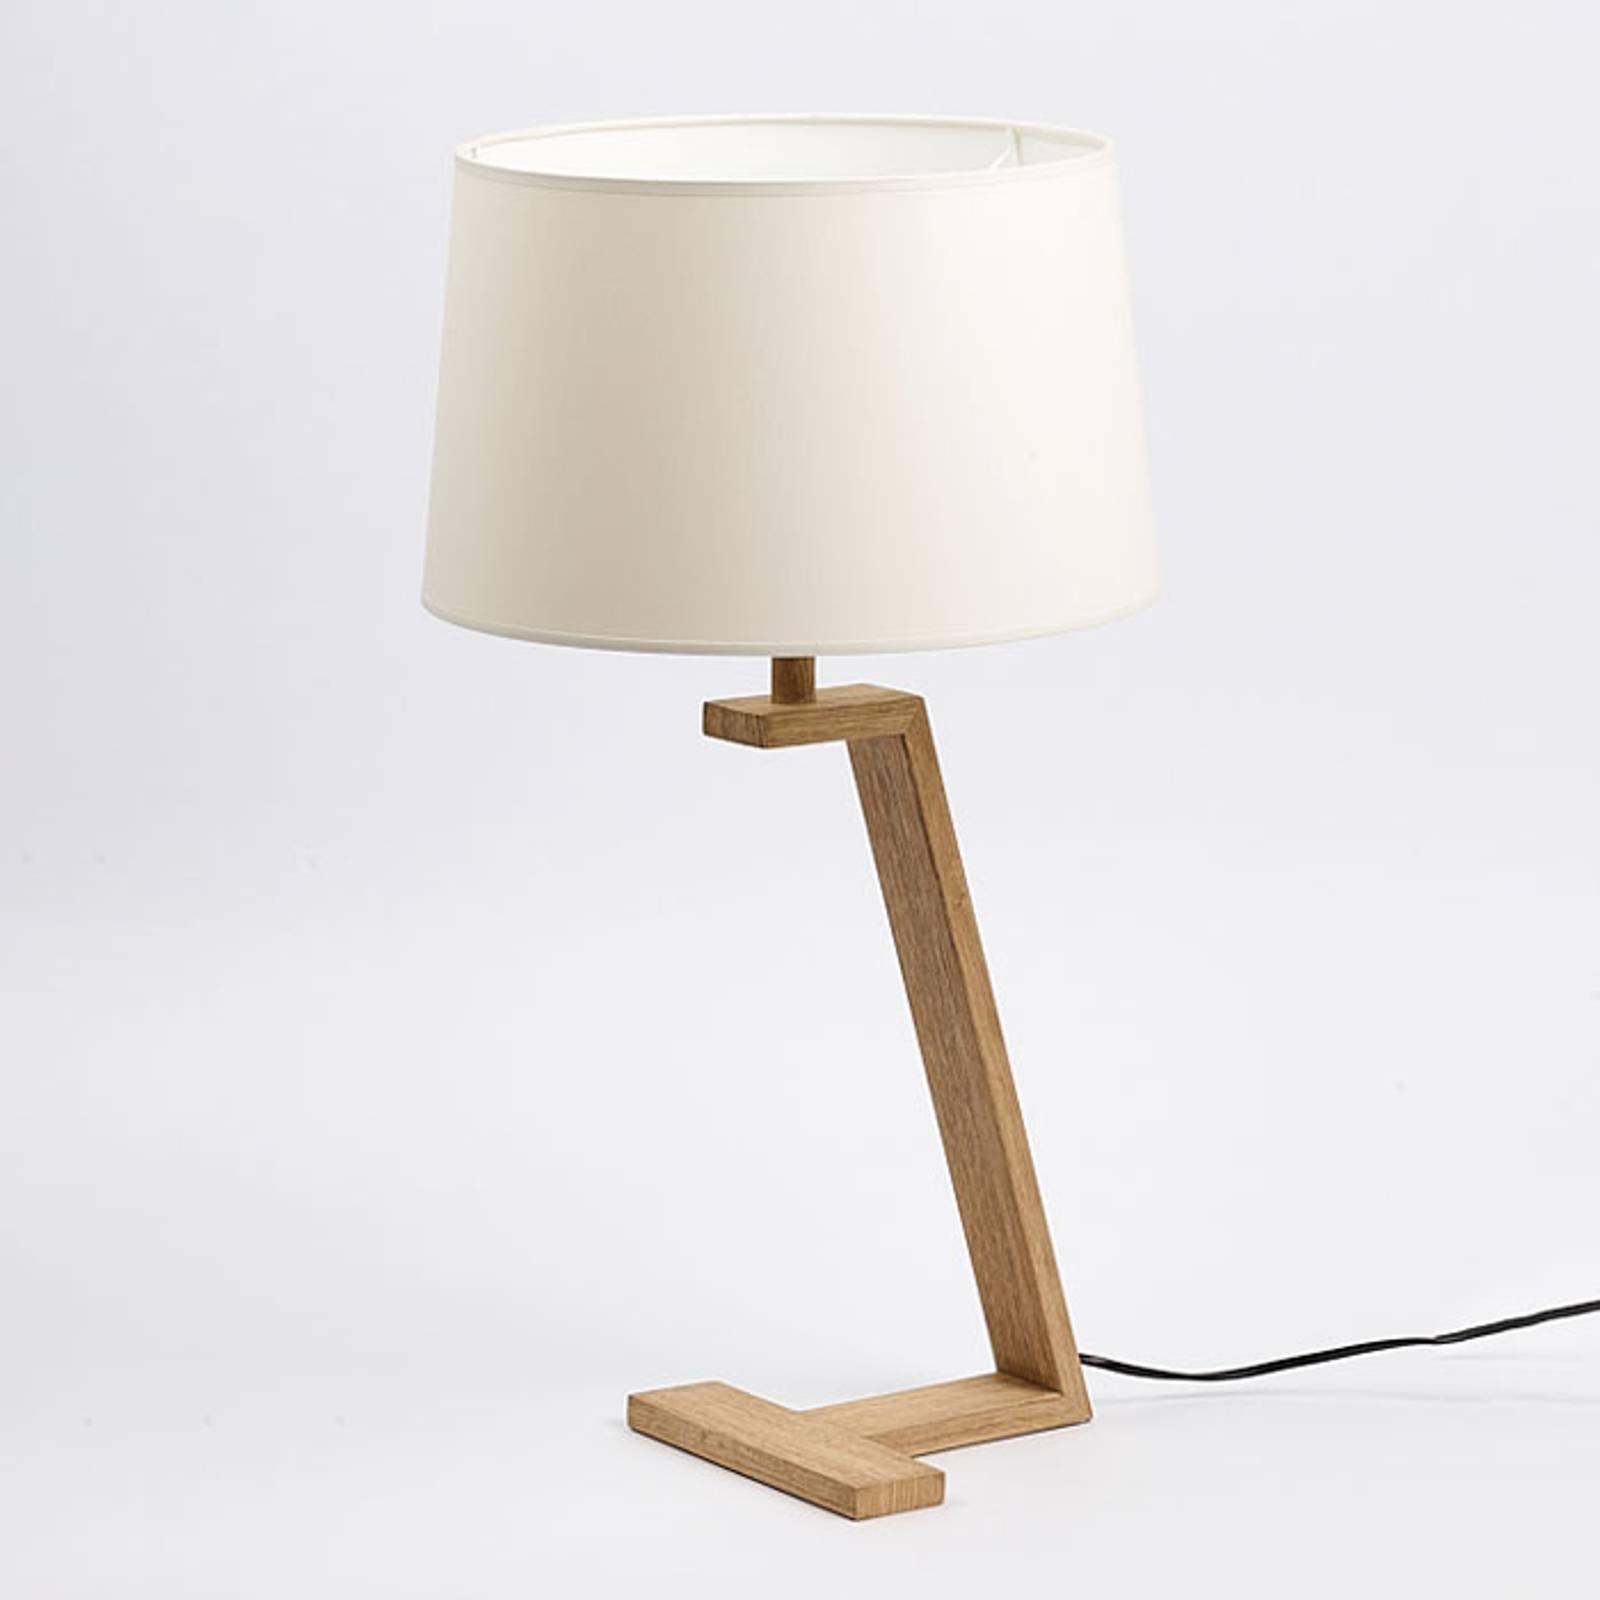 Tafellamp Memphis LT van hout en stof, wit